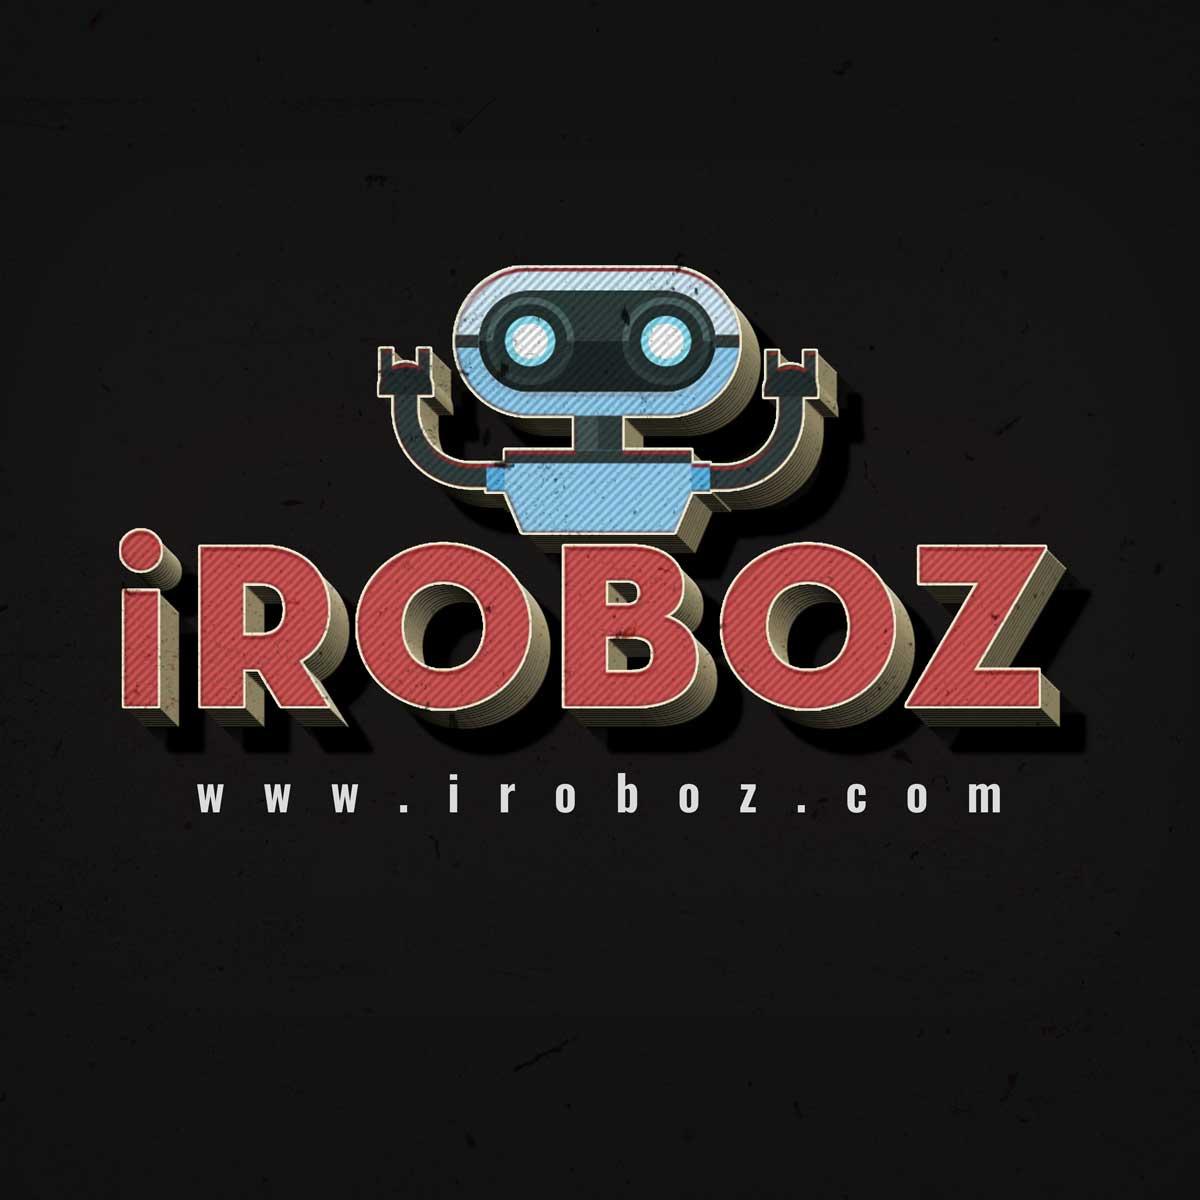 irob_9